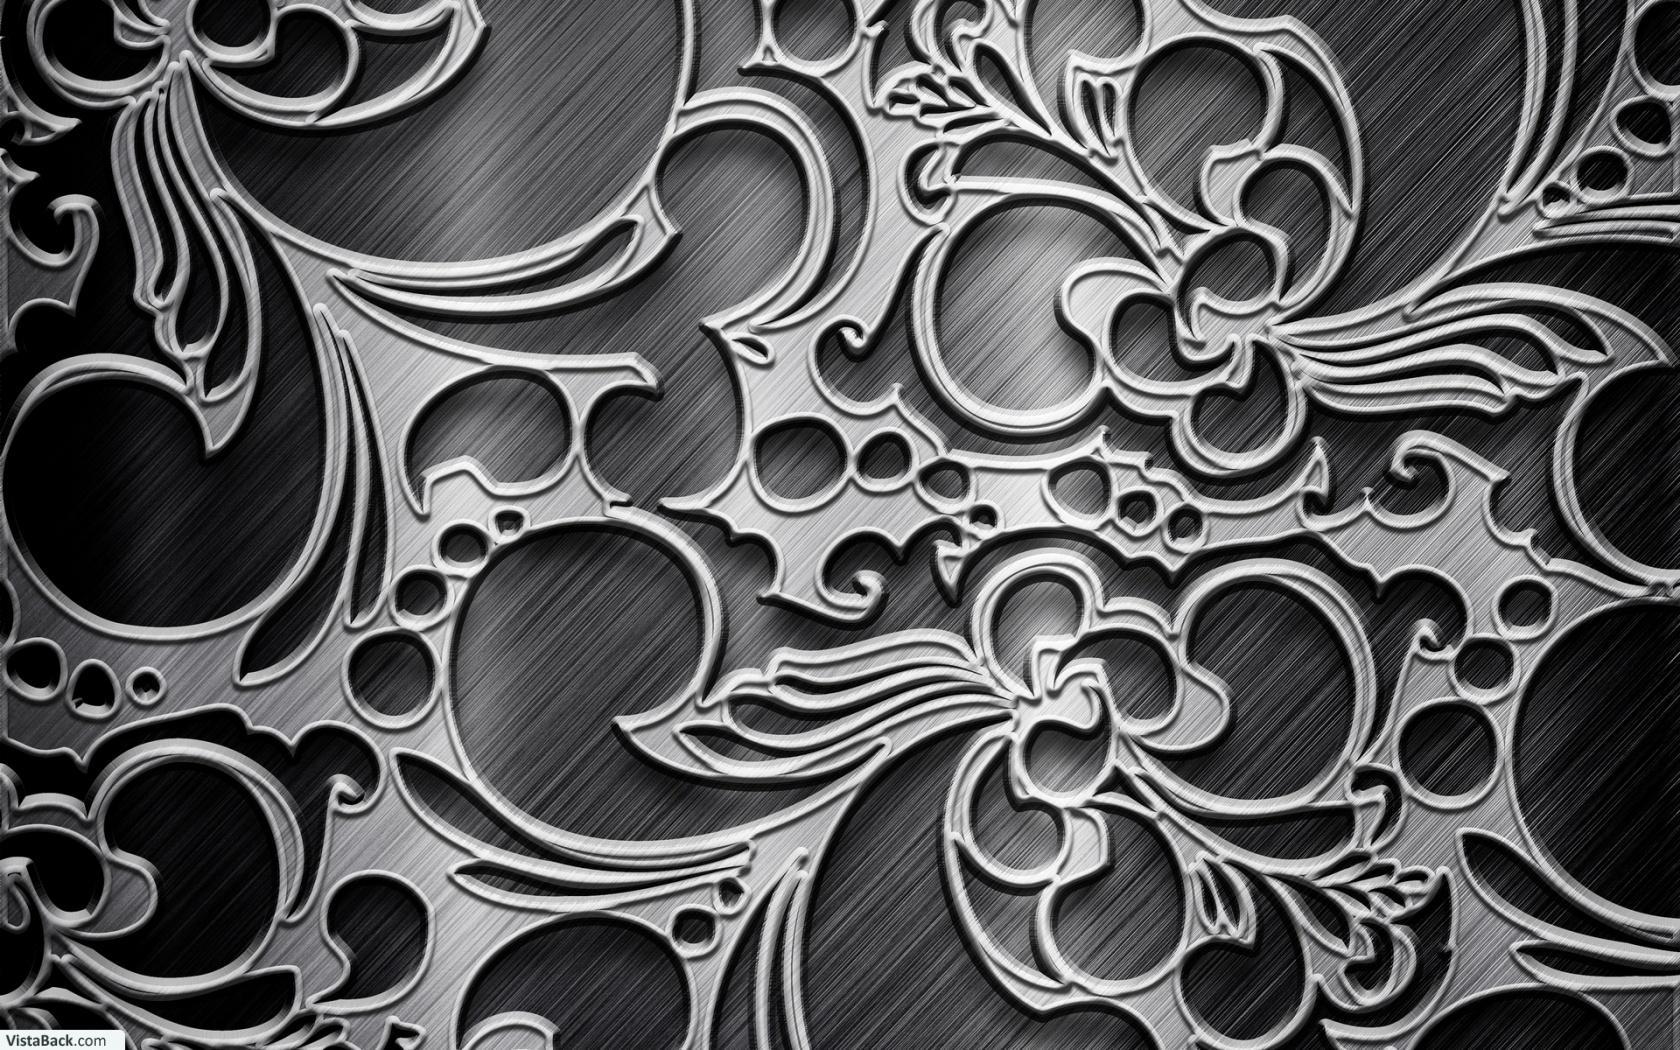 Download Texture Metallic Black Silver Pattern Wallpaper 1680x1050 1680x1050